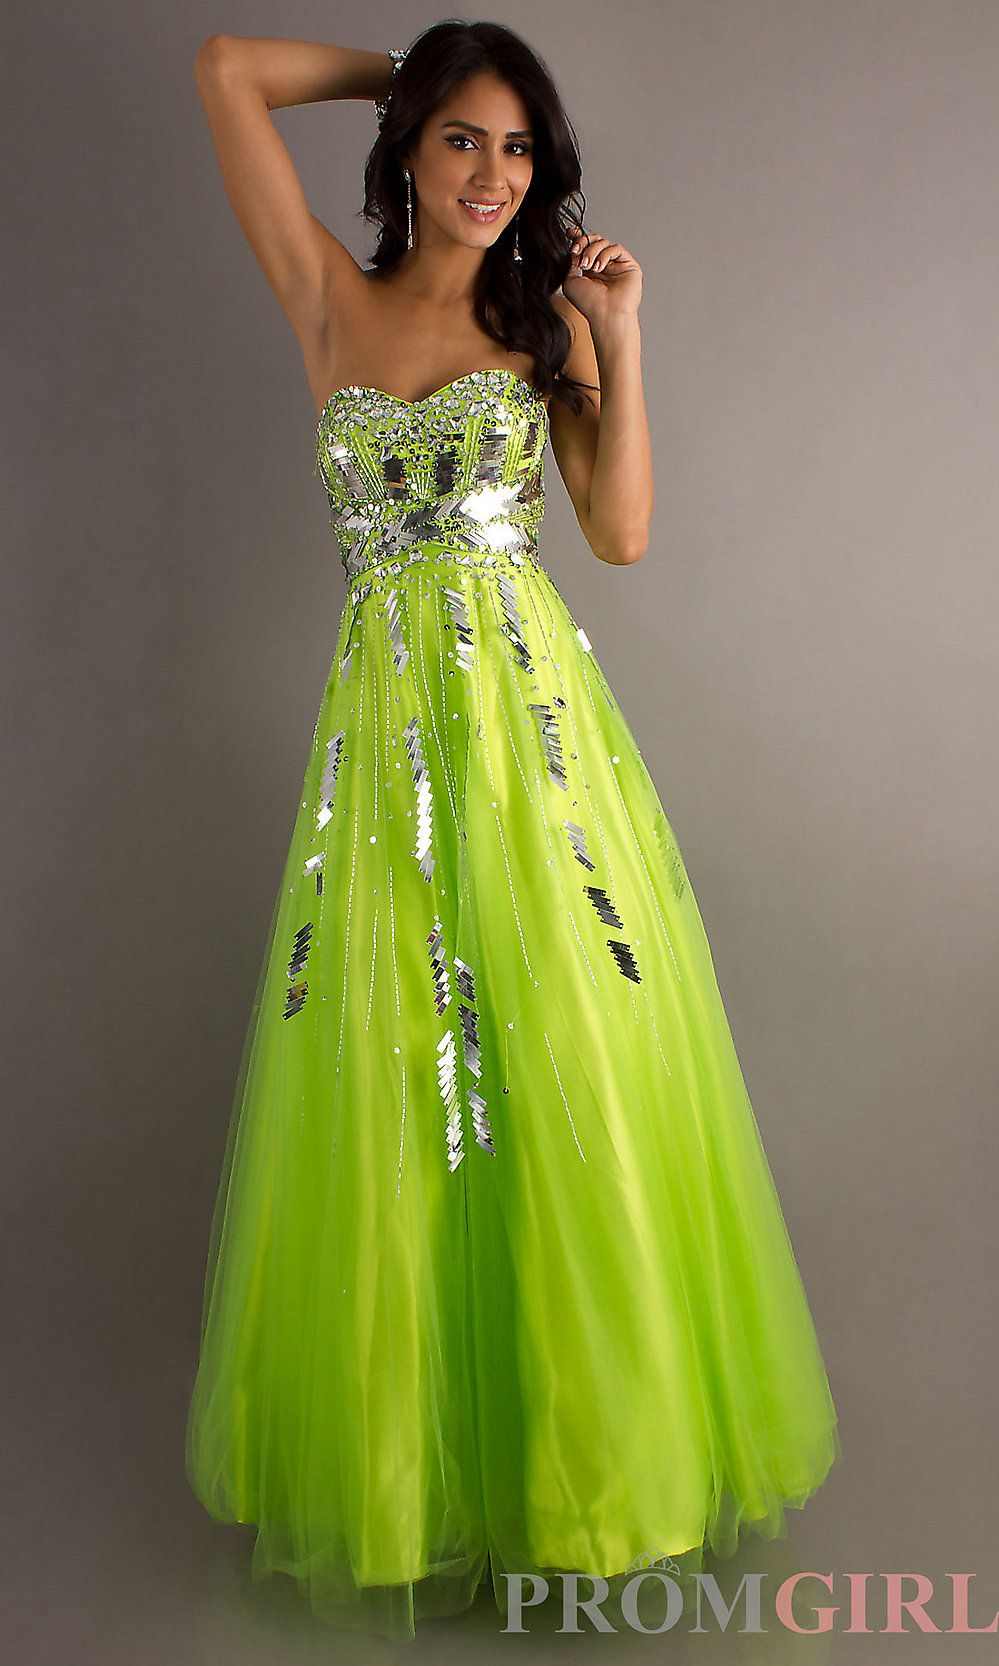 prom dresses, Prom girl dresses